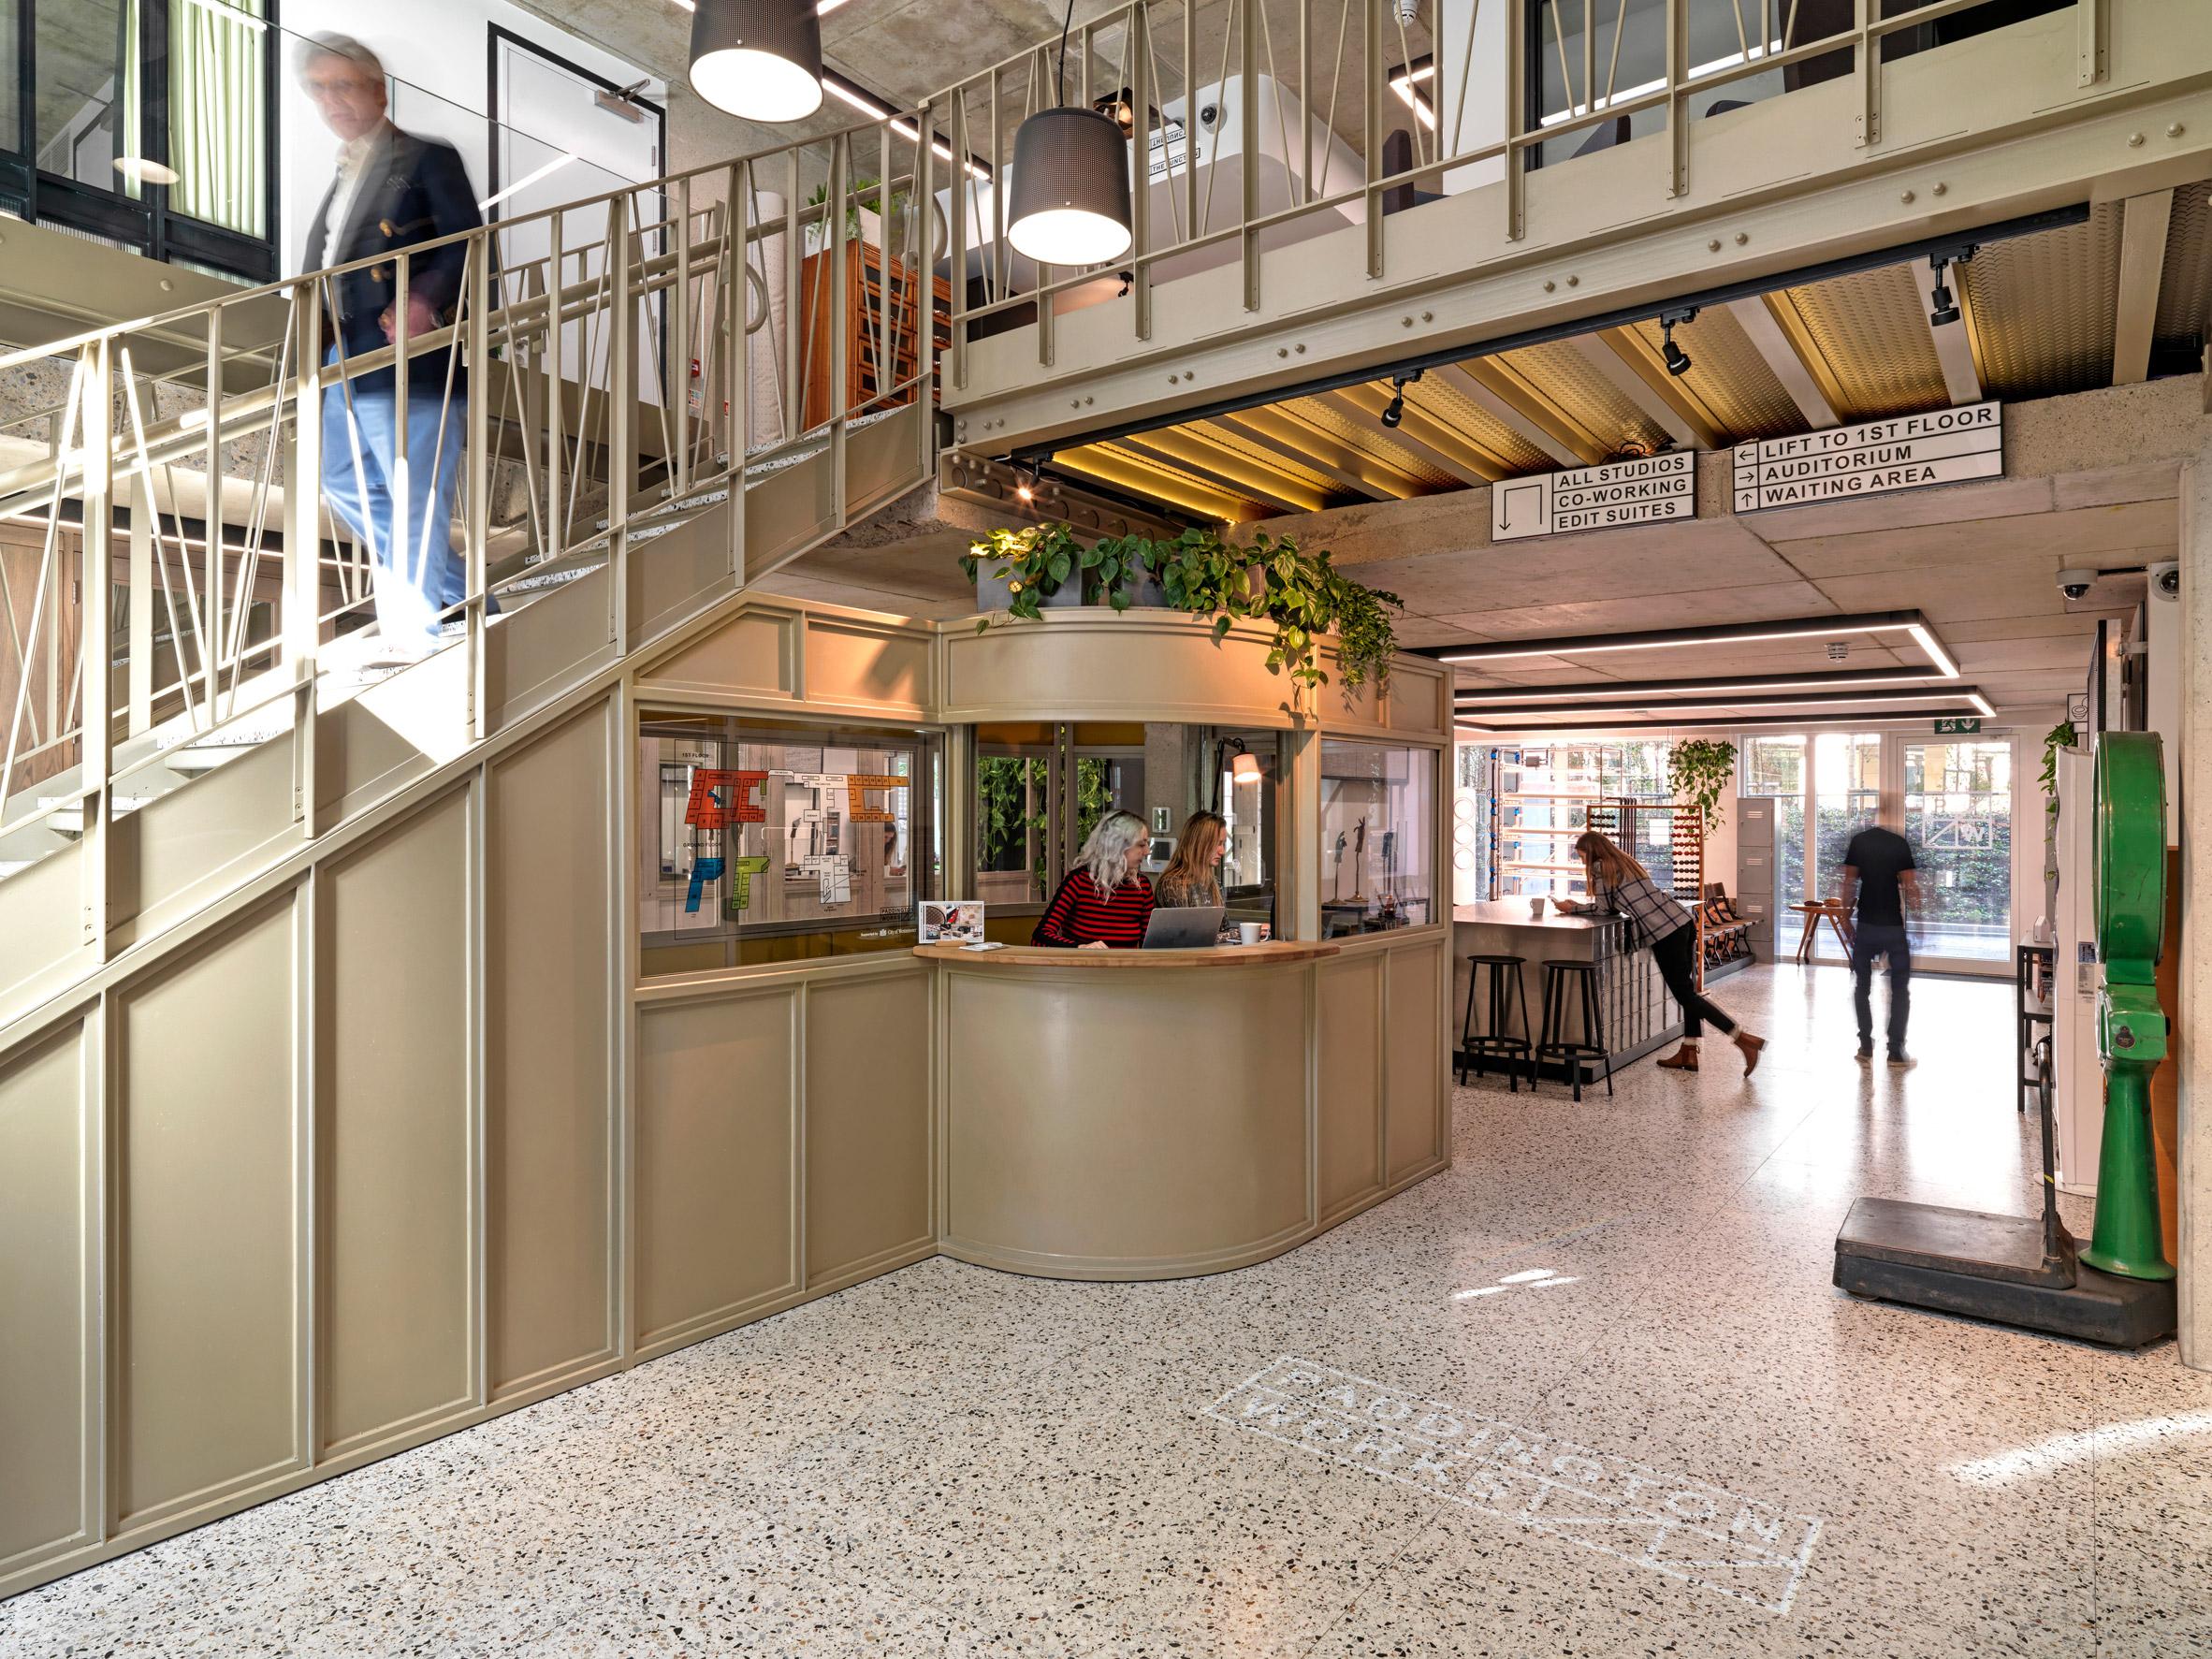 Entrance to Paddington Works by Threefold Architects